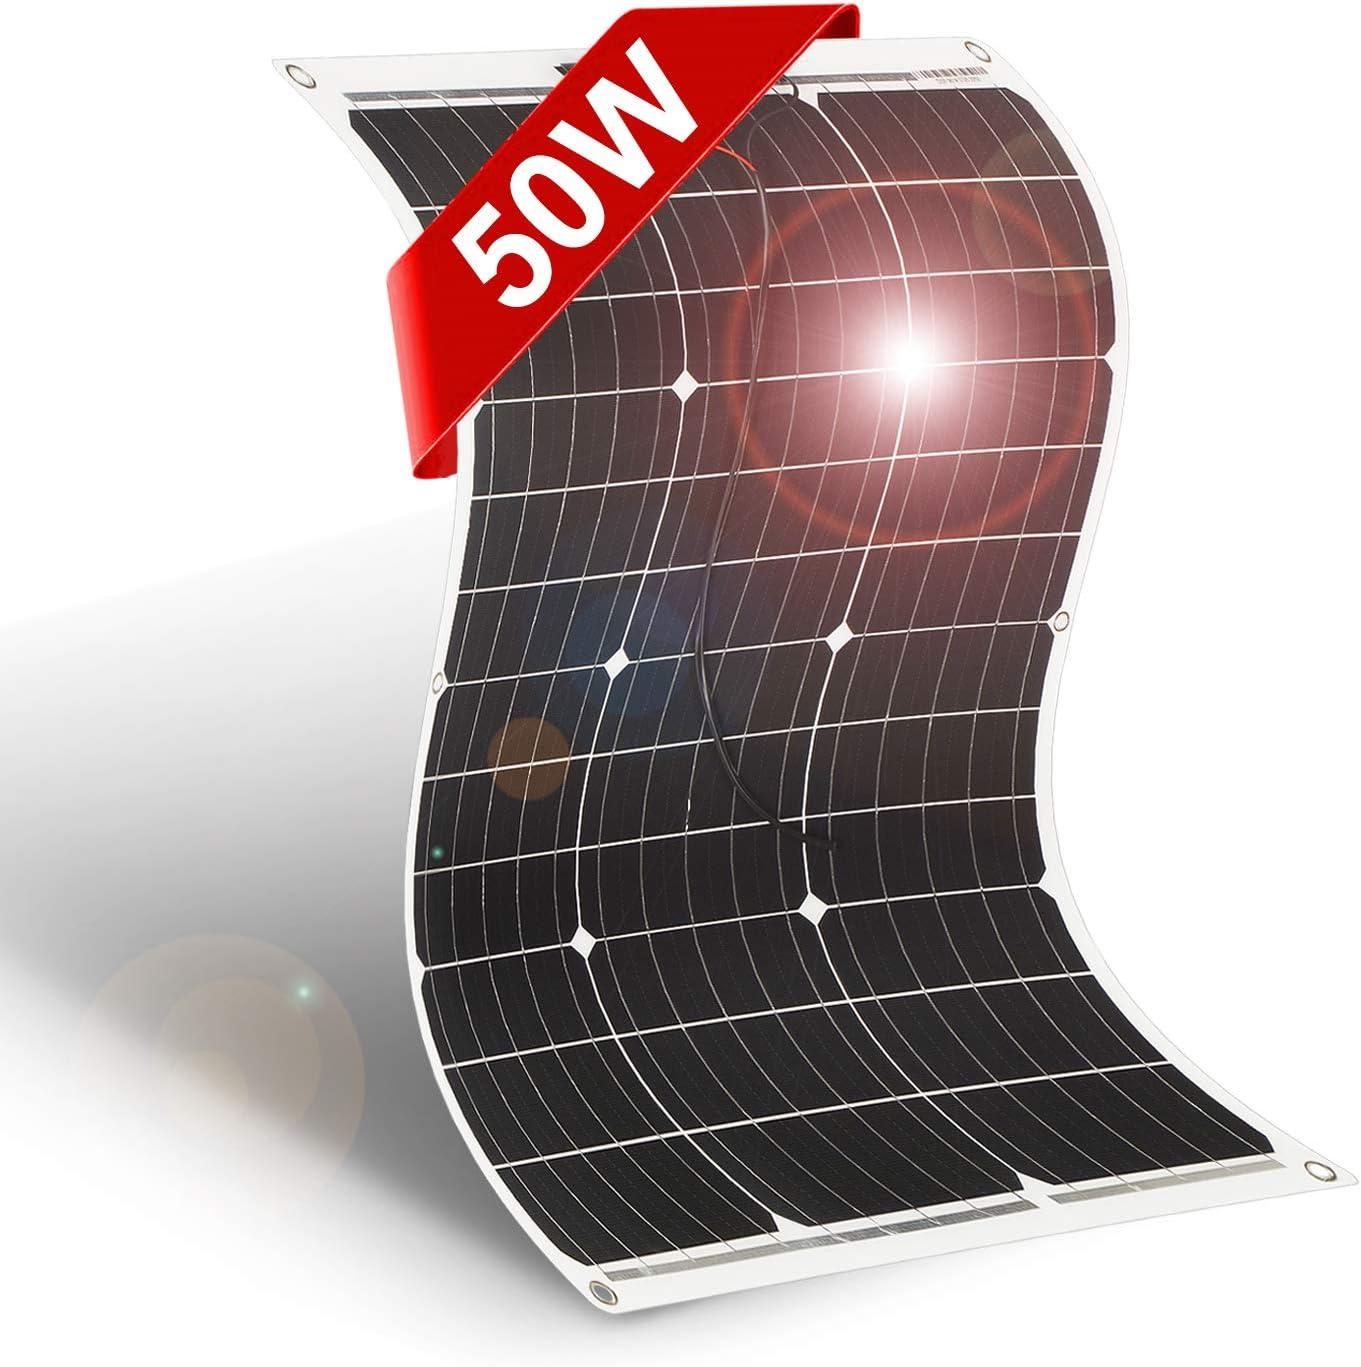 DOKIO Placa Solar Flexible Portatil 50W Solar Panel 12v para Autocaravanas Viajeros jardin